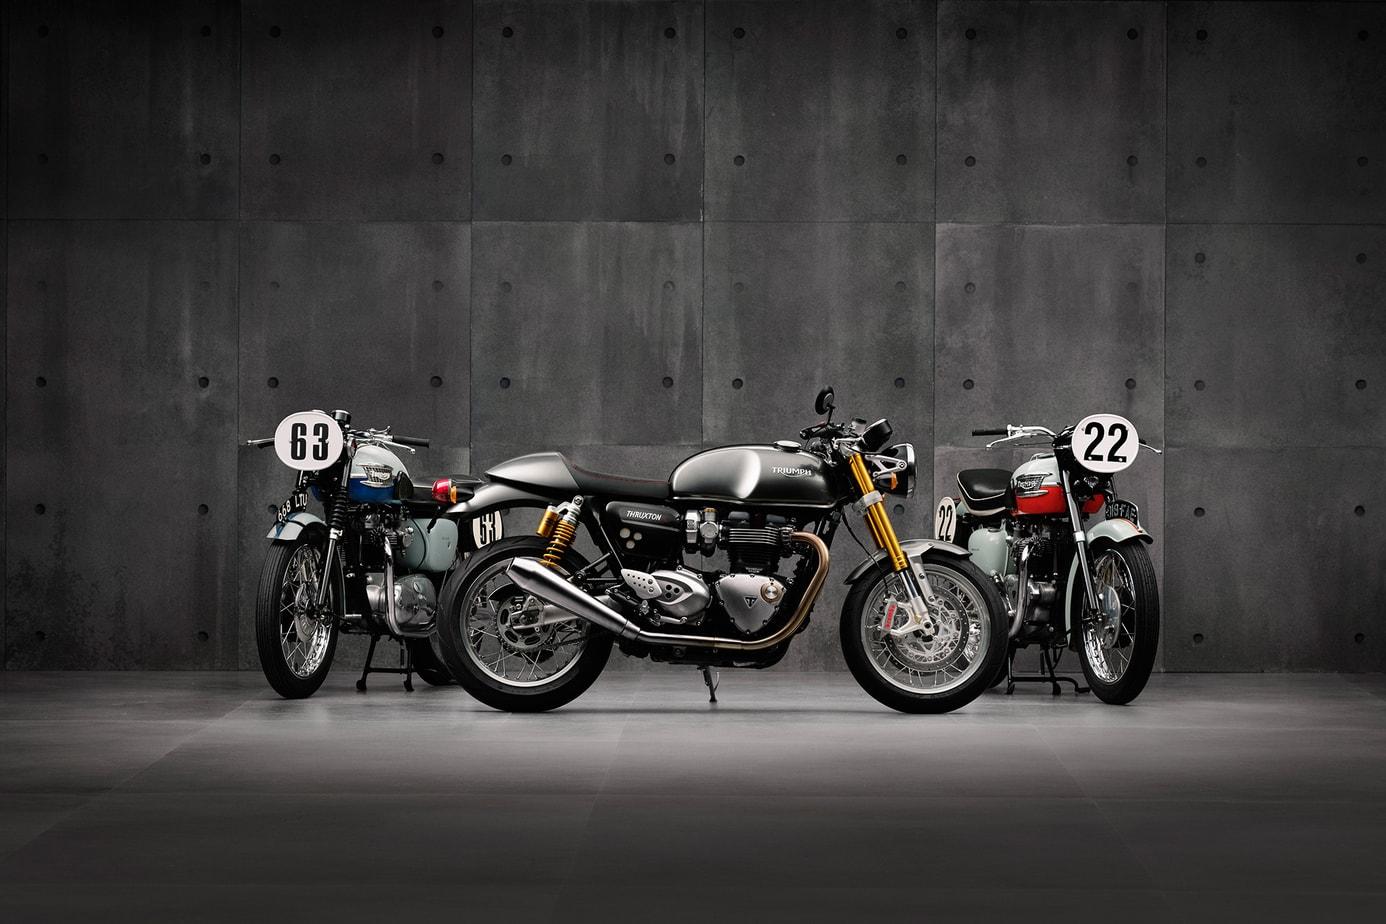 The Color Club - Triumph three heritage